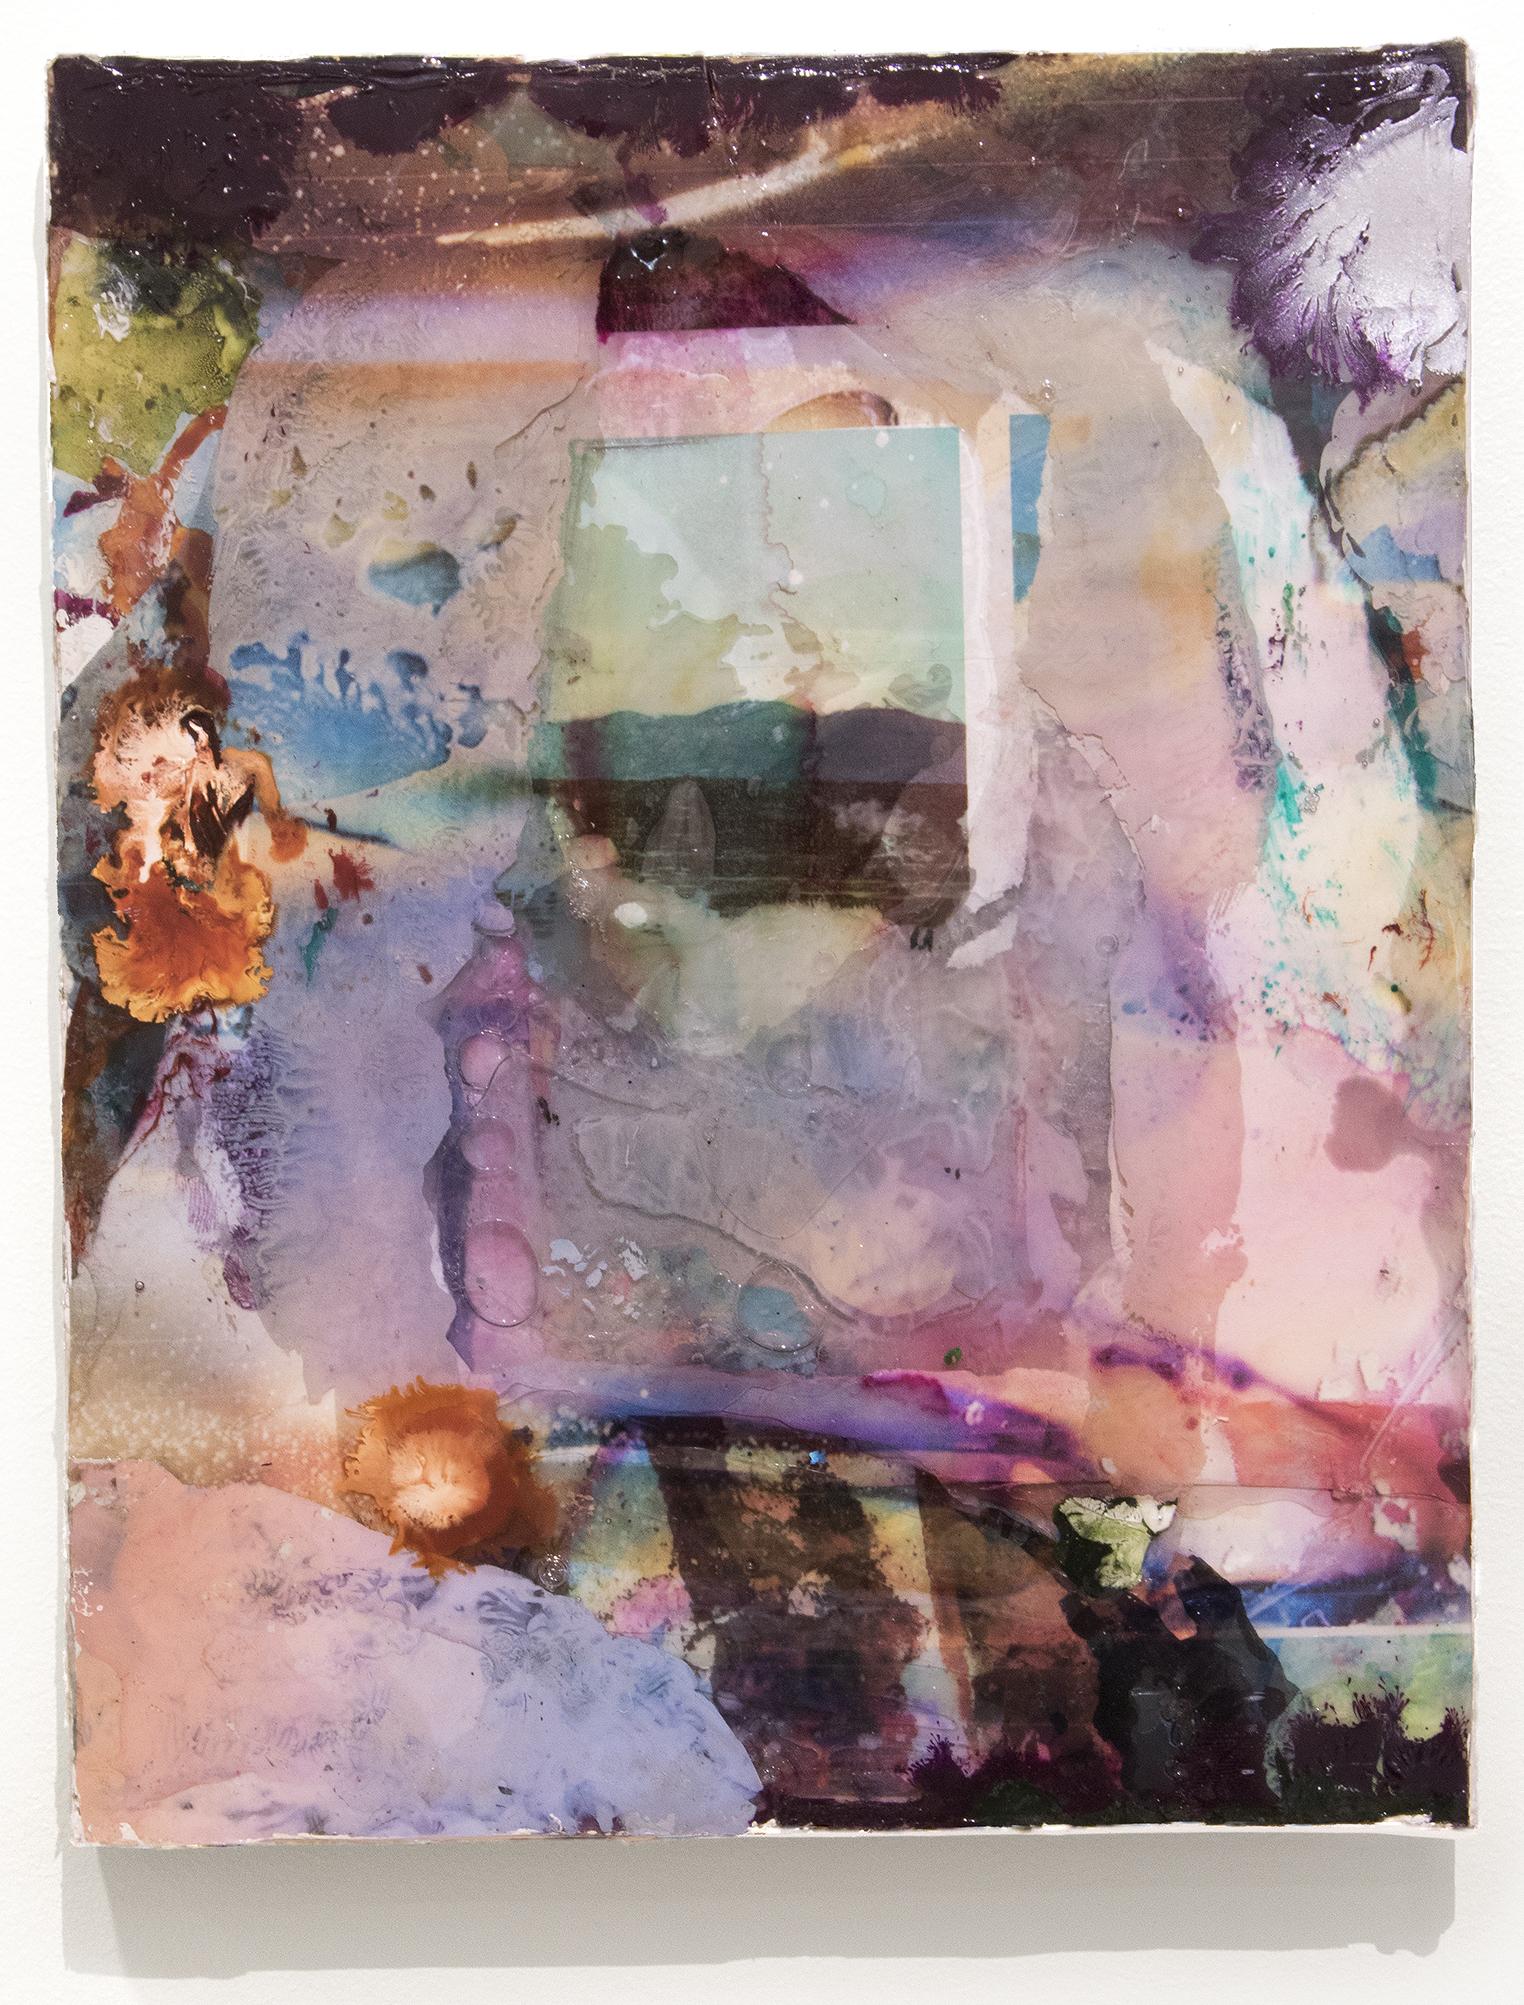 "Windfall. Ink, acrylic, digital photo fragment, inkjet transparencies, epoxy resin on canvas. 8x10"". 2017"